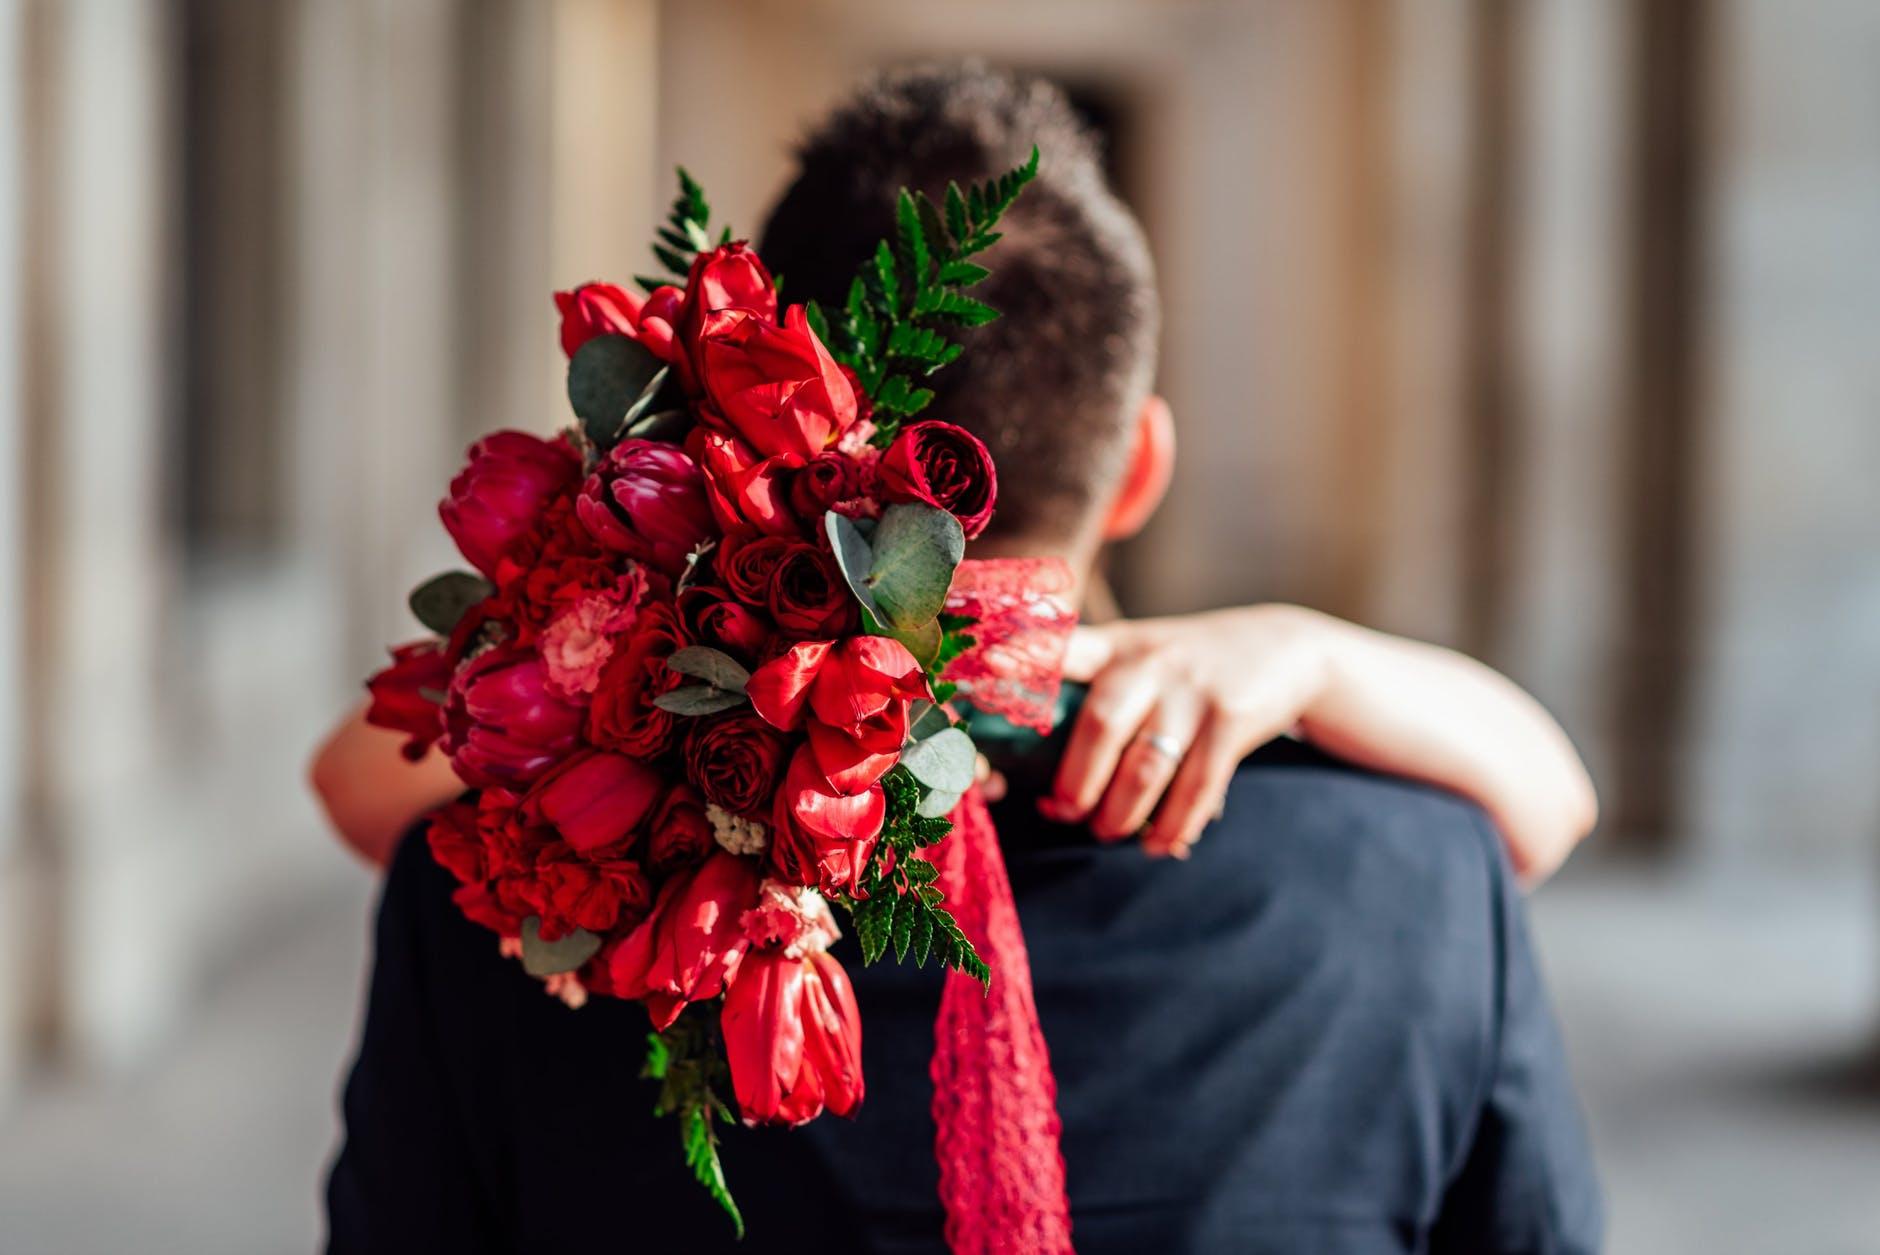 Pokazatelji da je muškarac zaljubljen  beautiful wedding bouquet